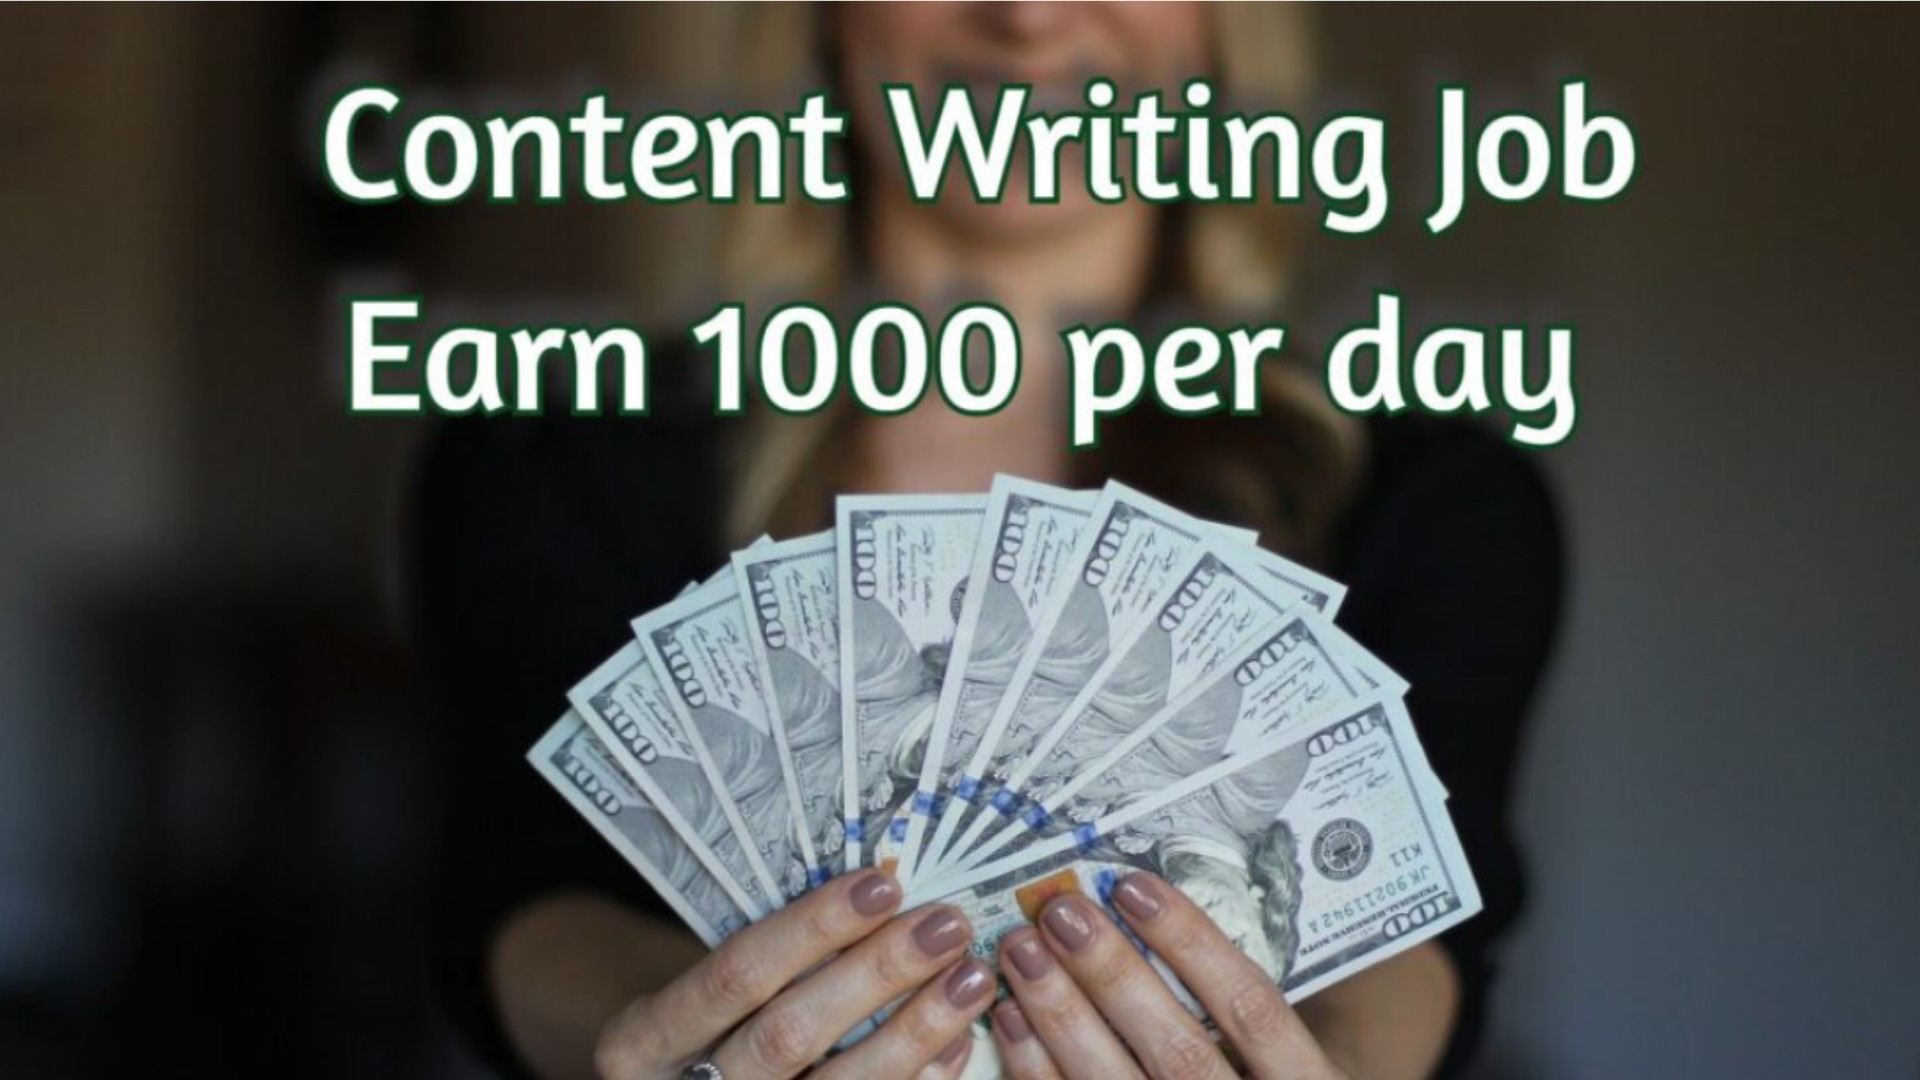 Content Writing Job